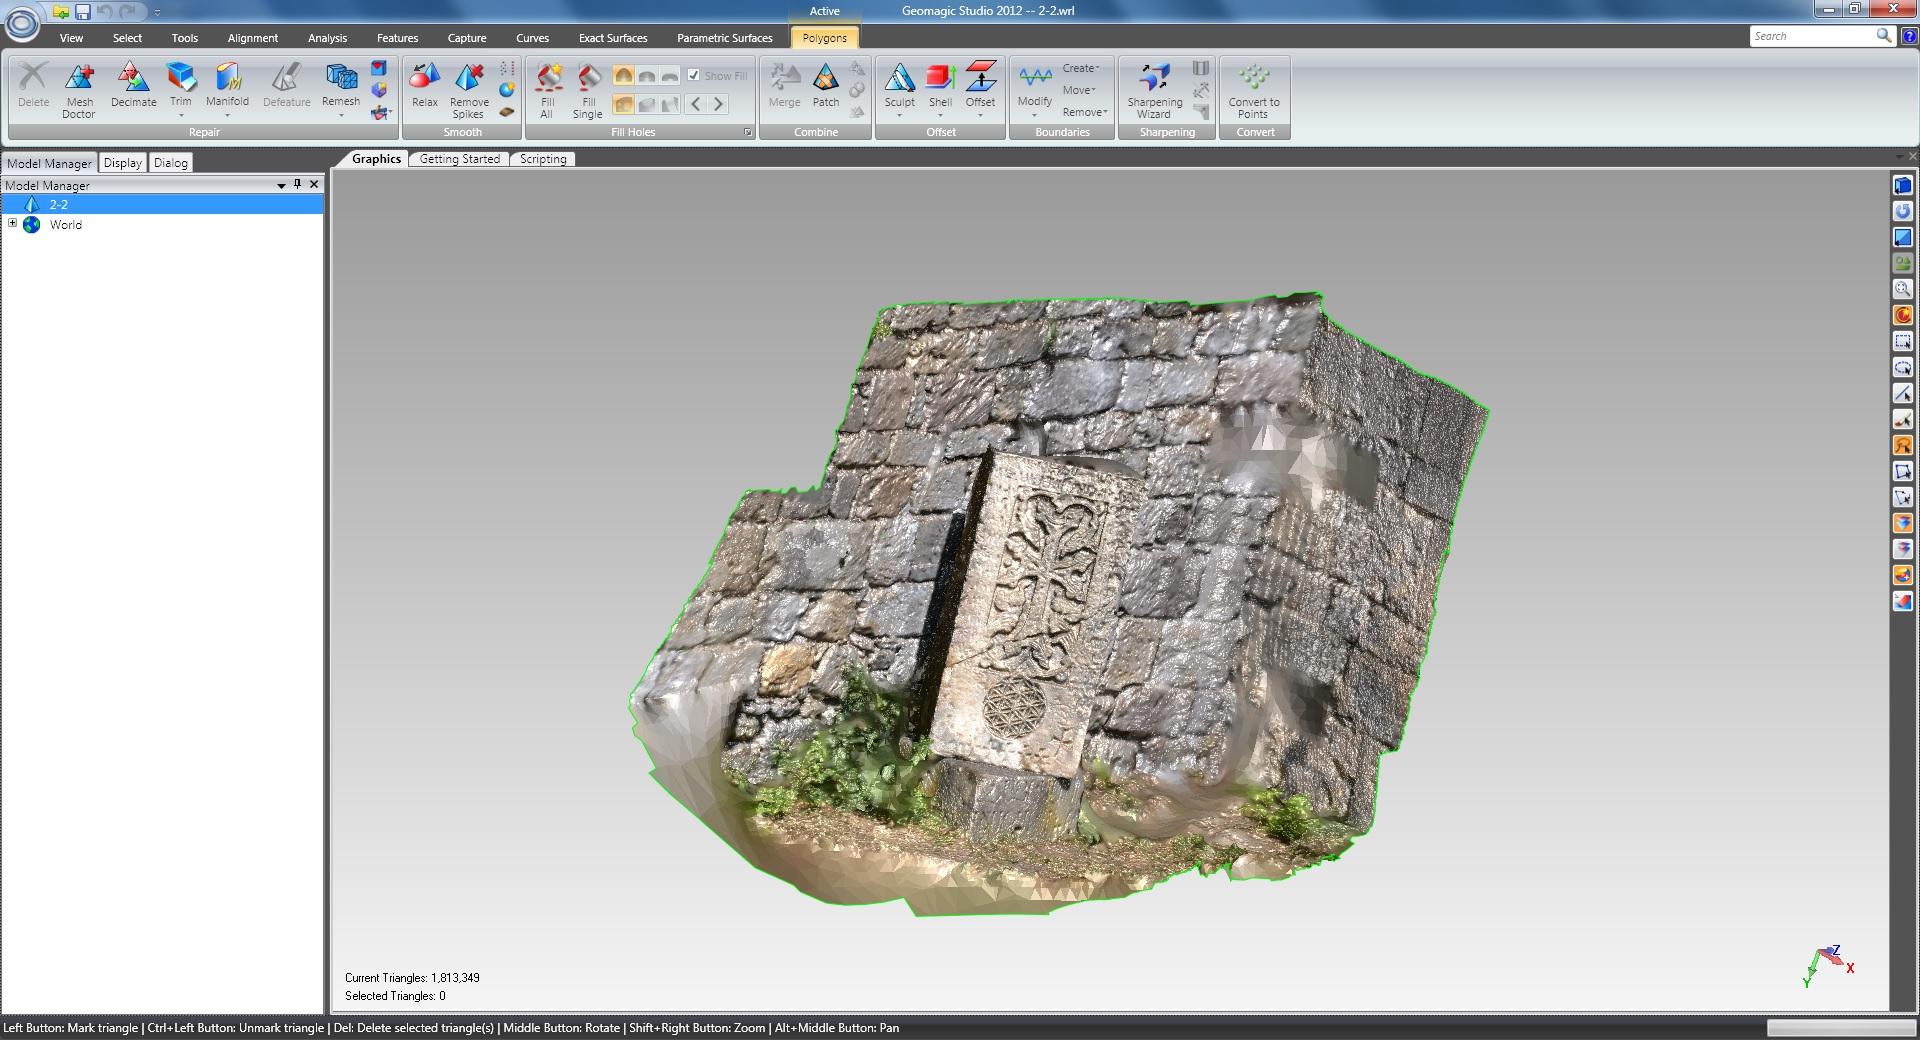 Working with Geomagic Studio 2012 64 bit